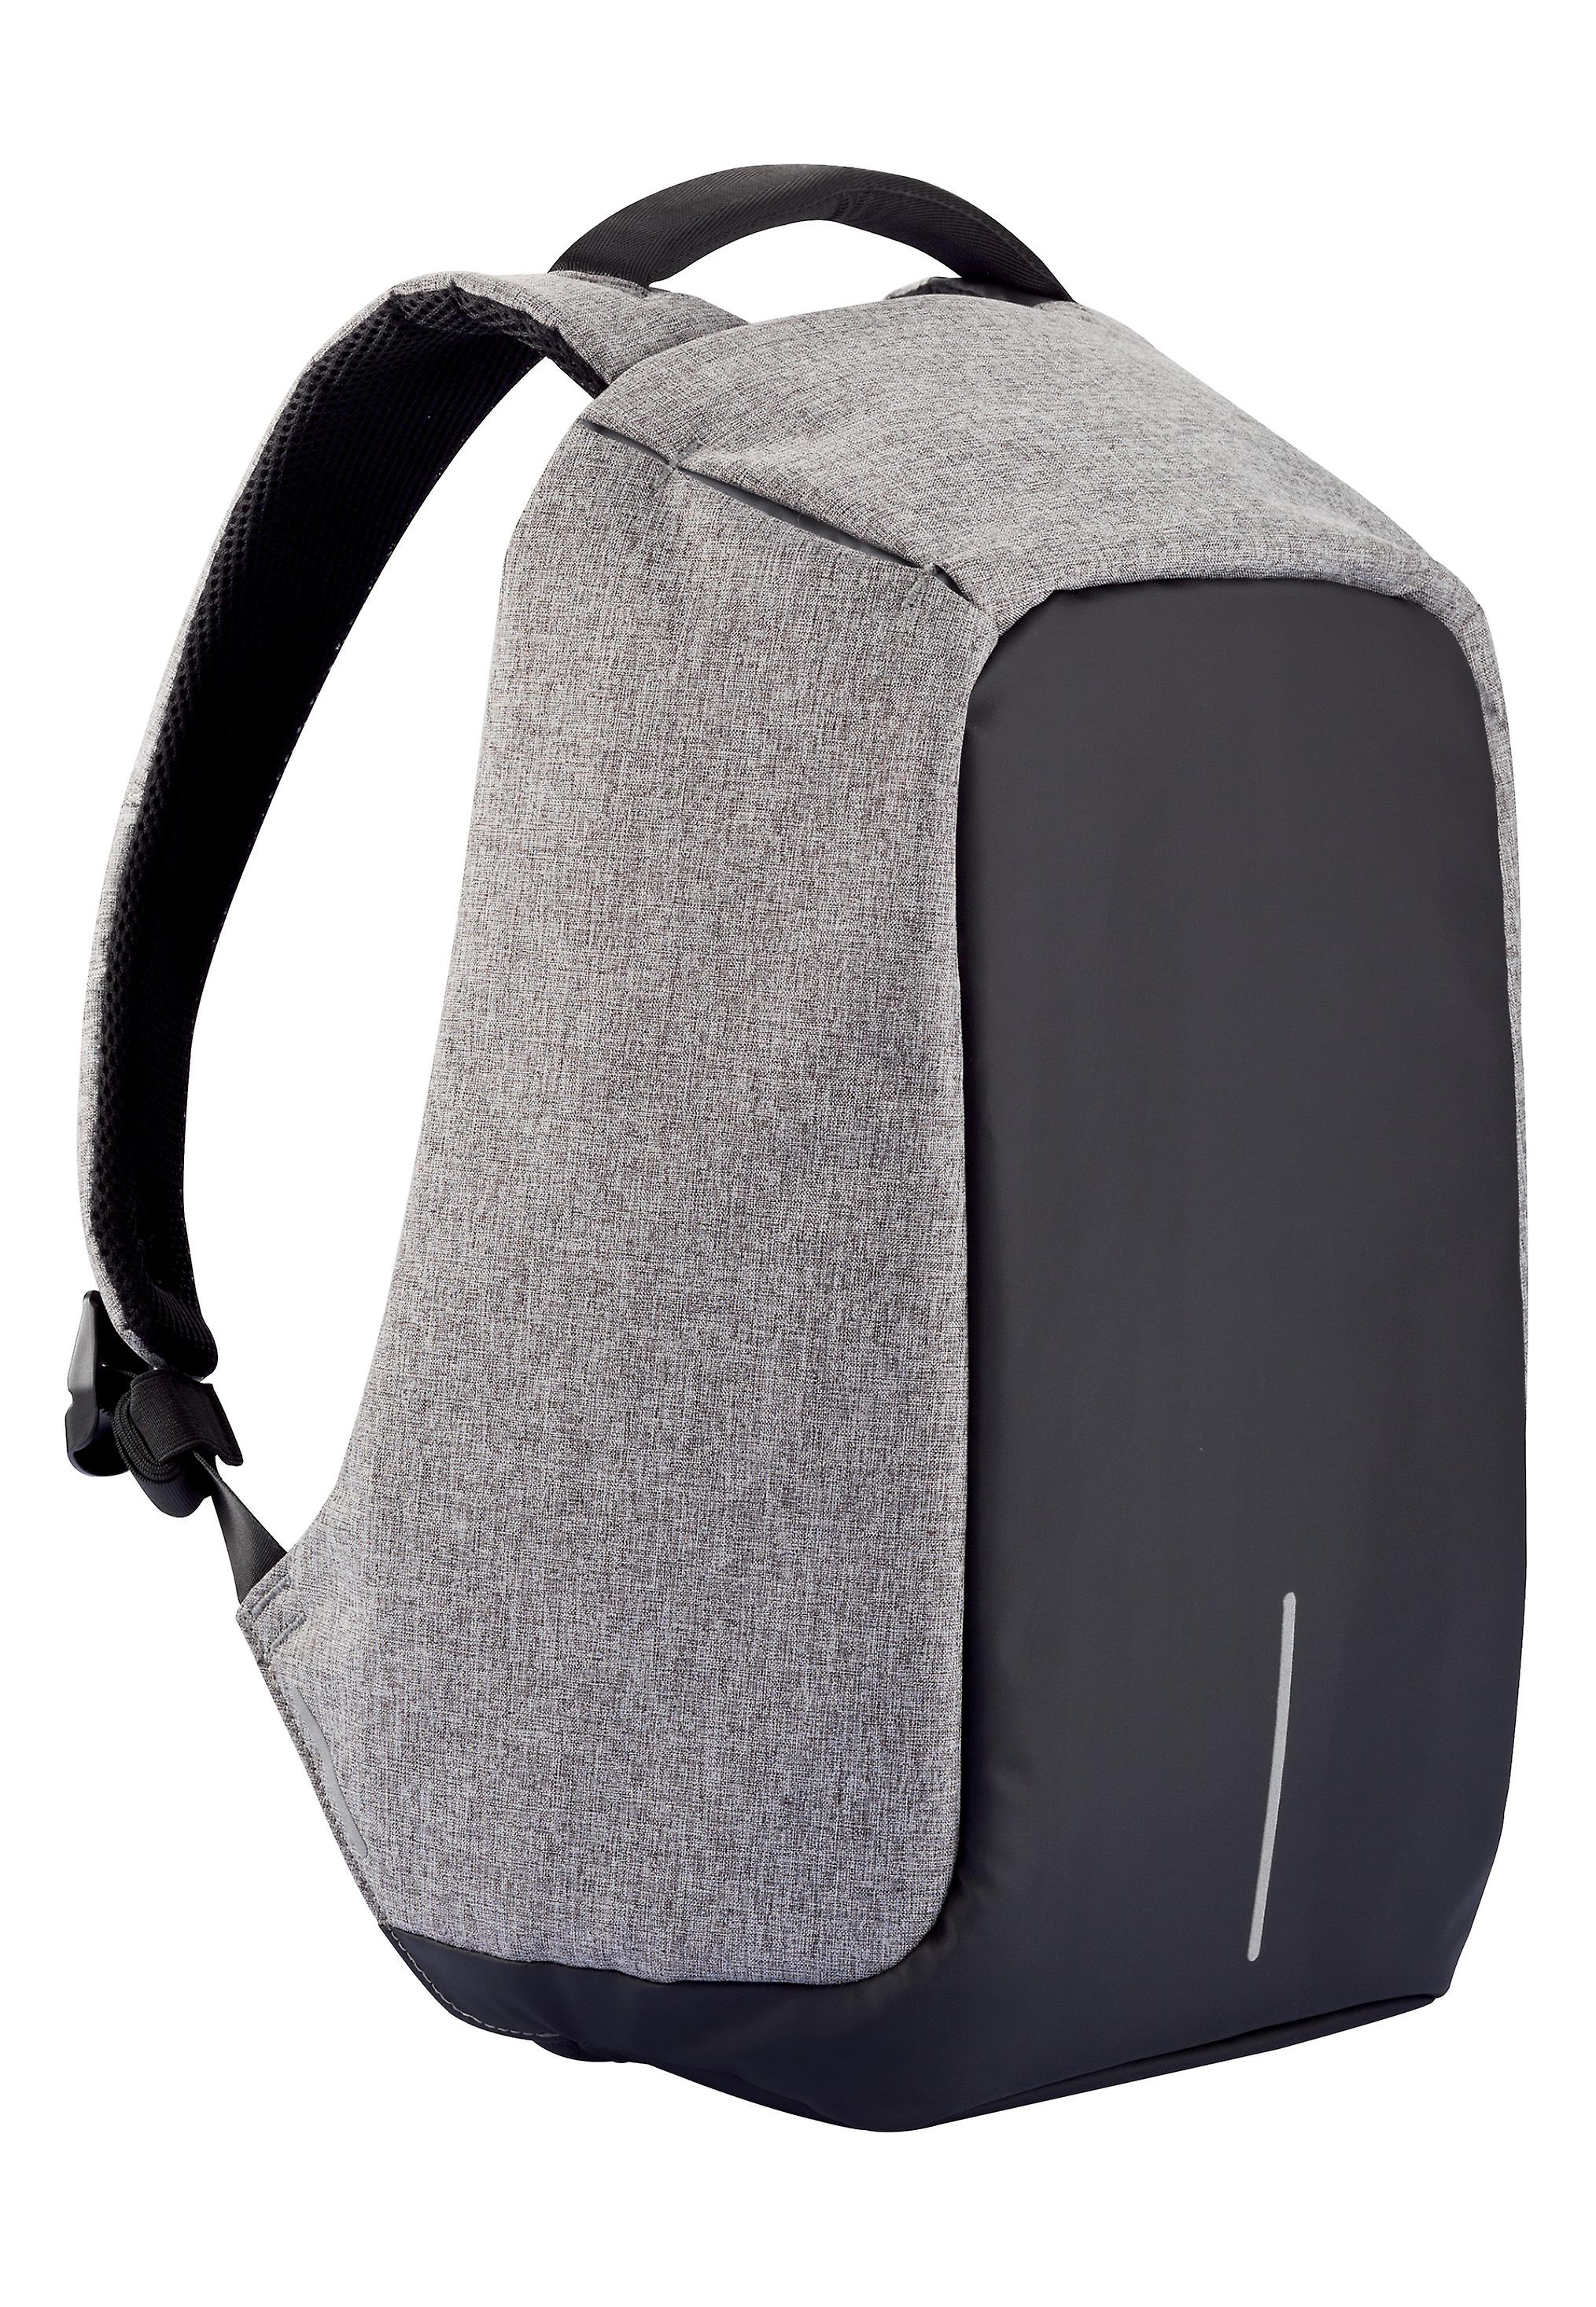 XD Design Bobby oorspronkelijke anti-diefstal laptop rugzak met USB (unisex)